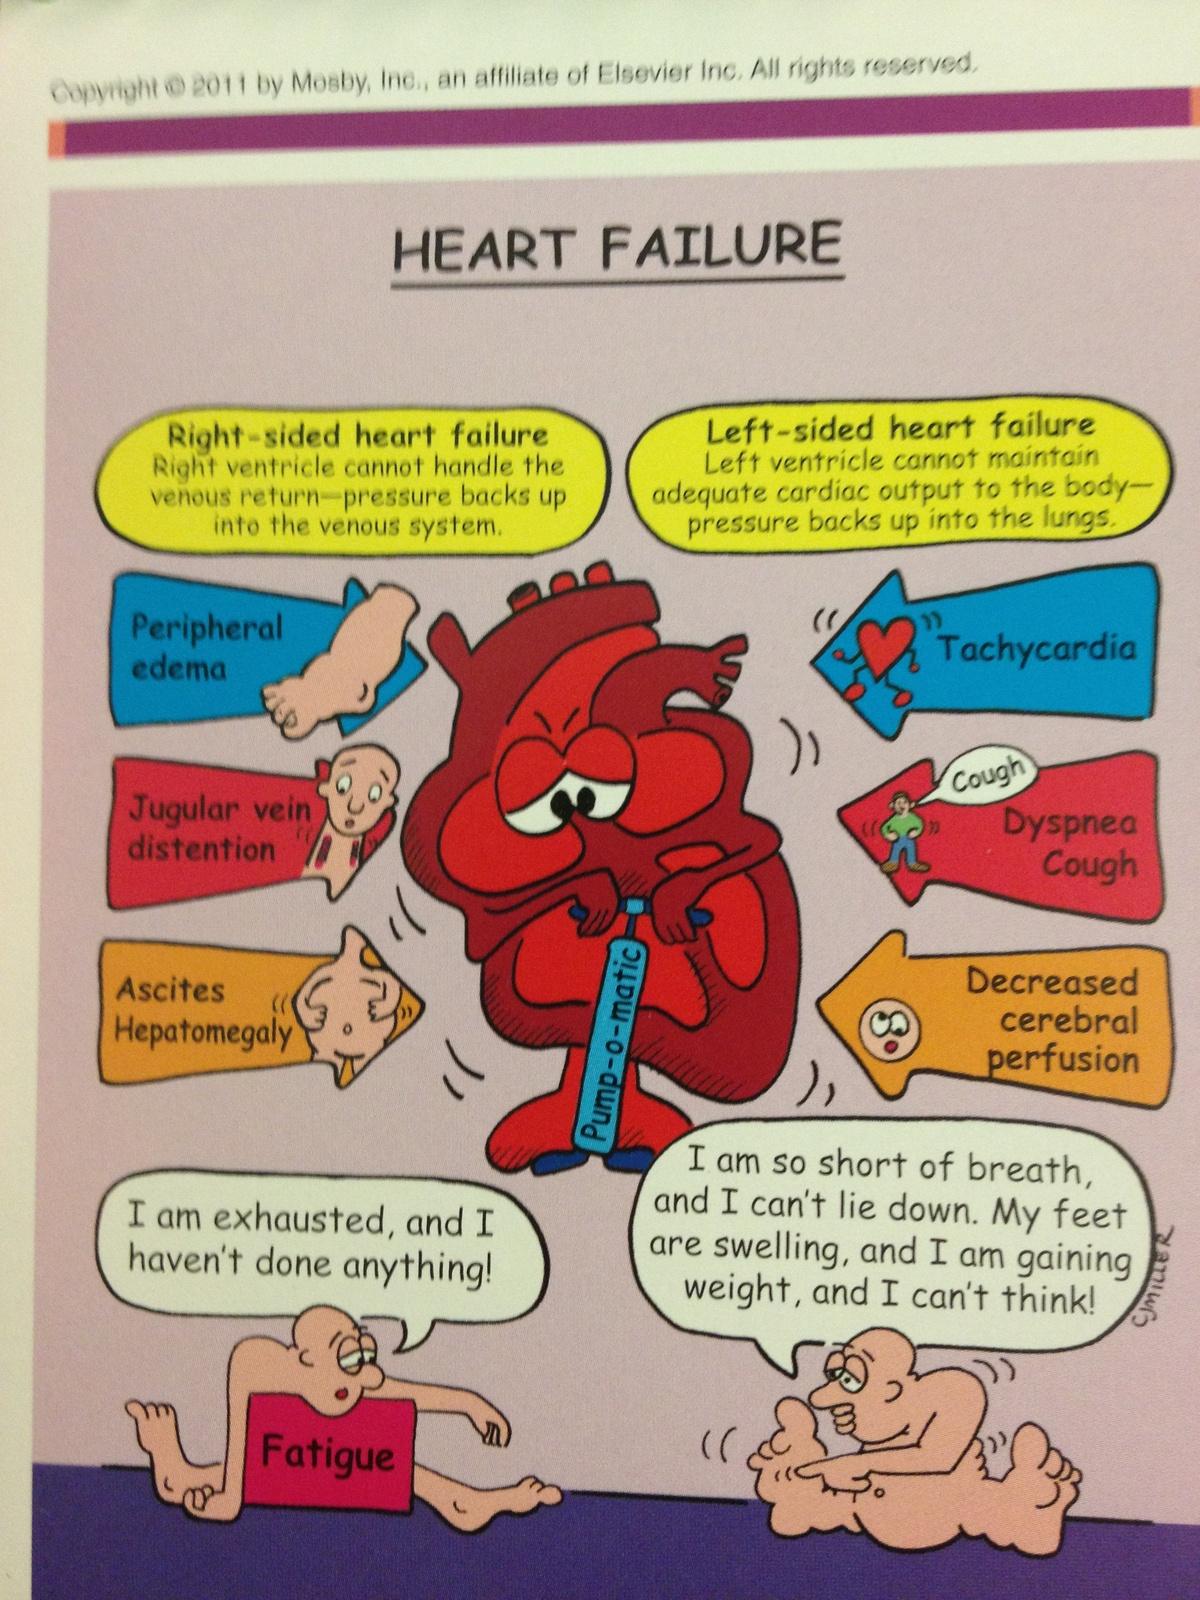 Pathophysiology right side heart failure case study